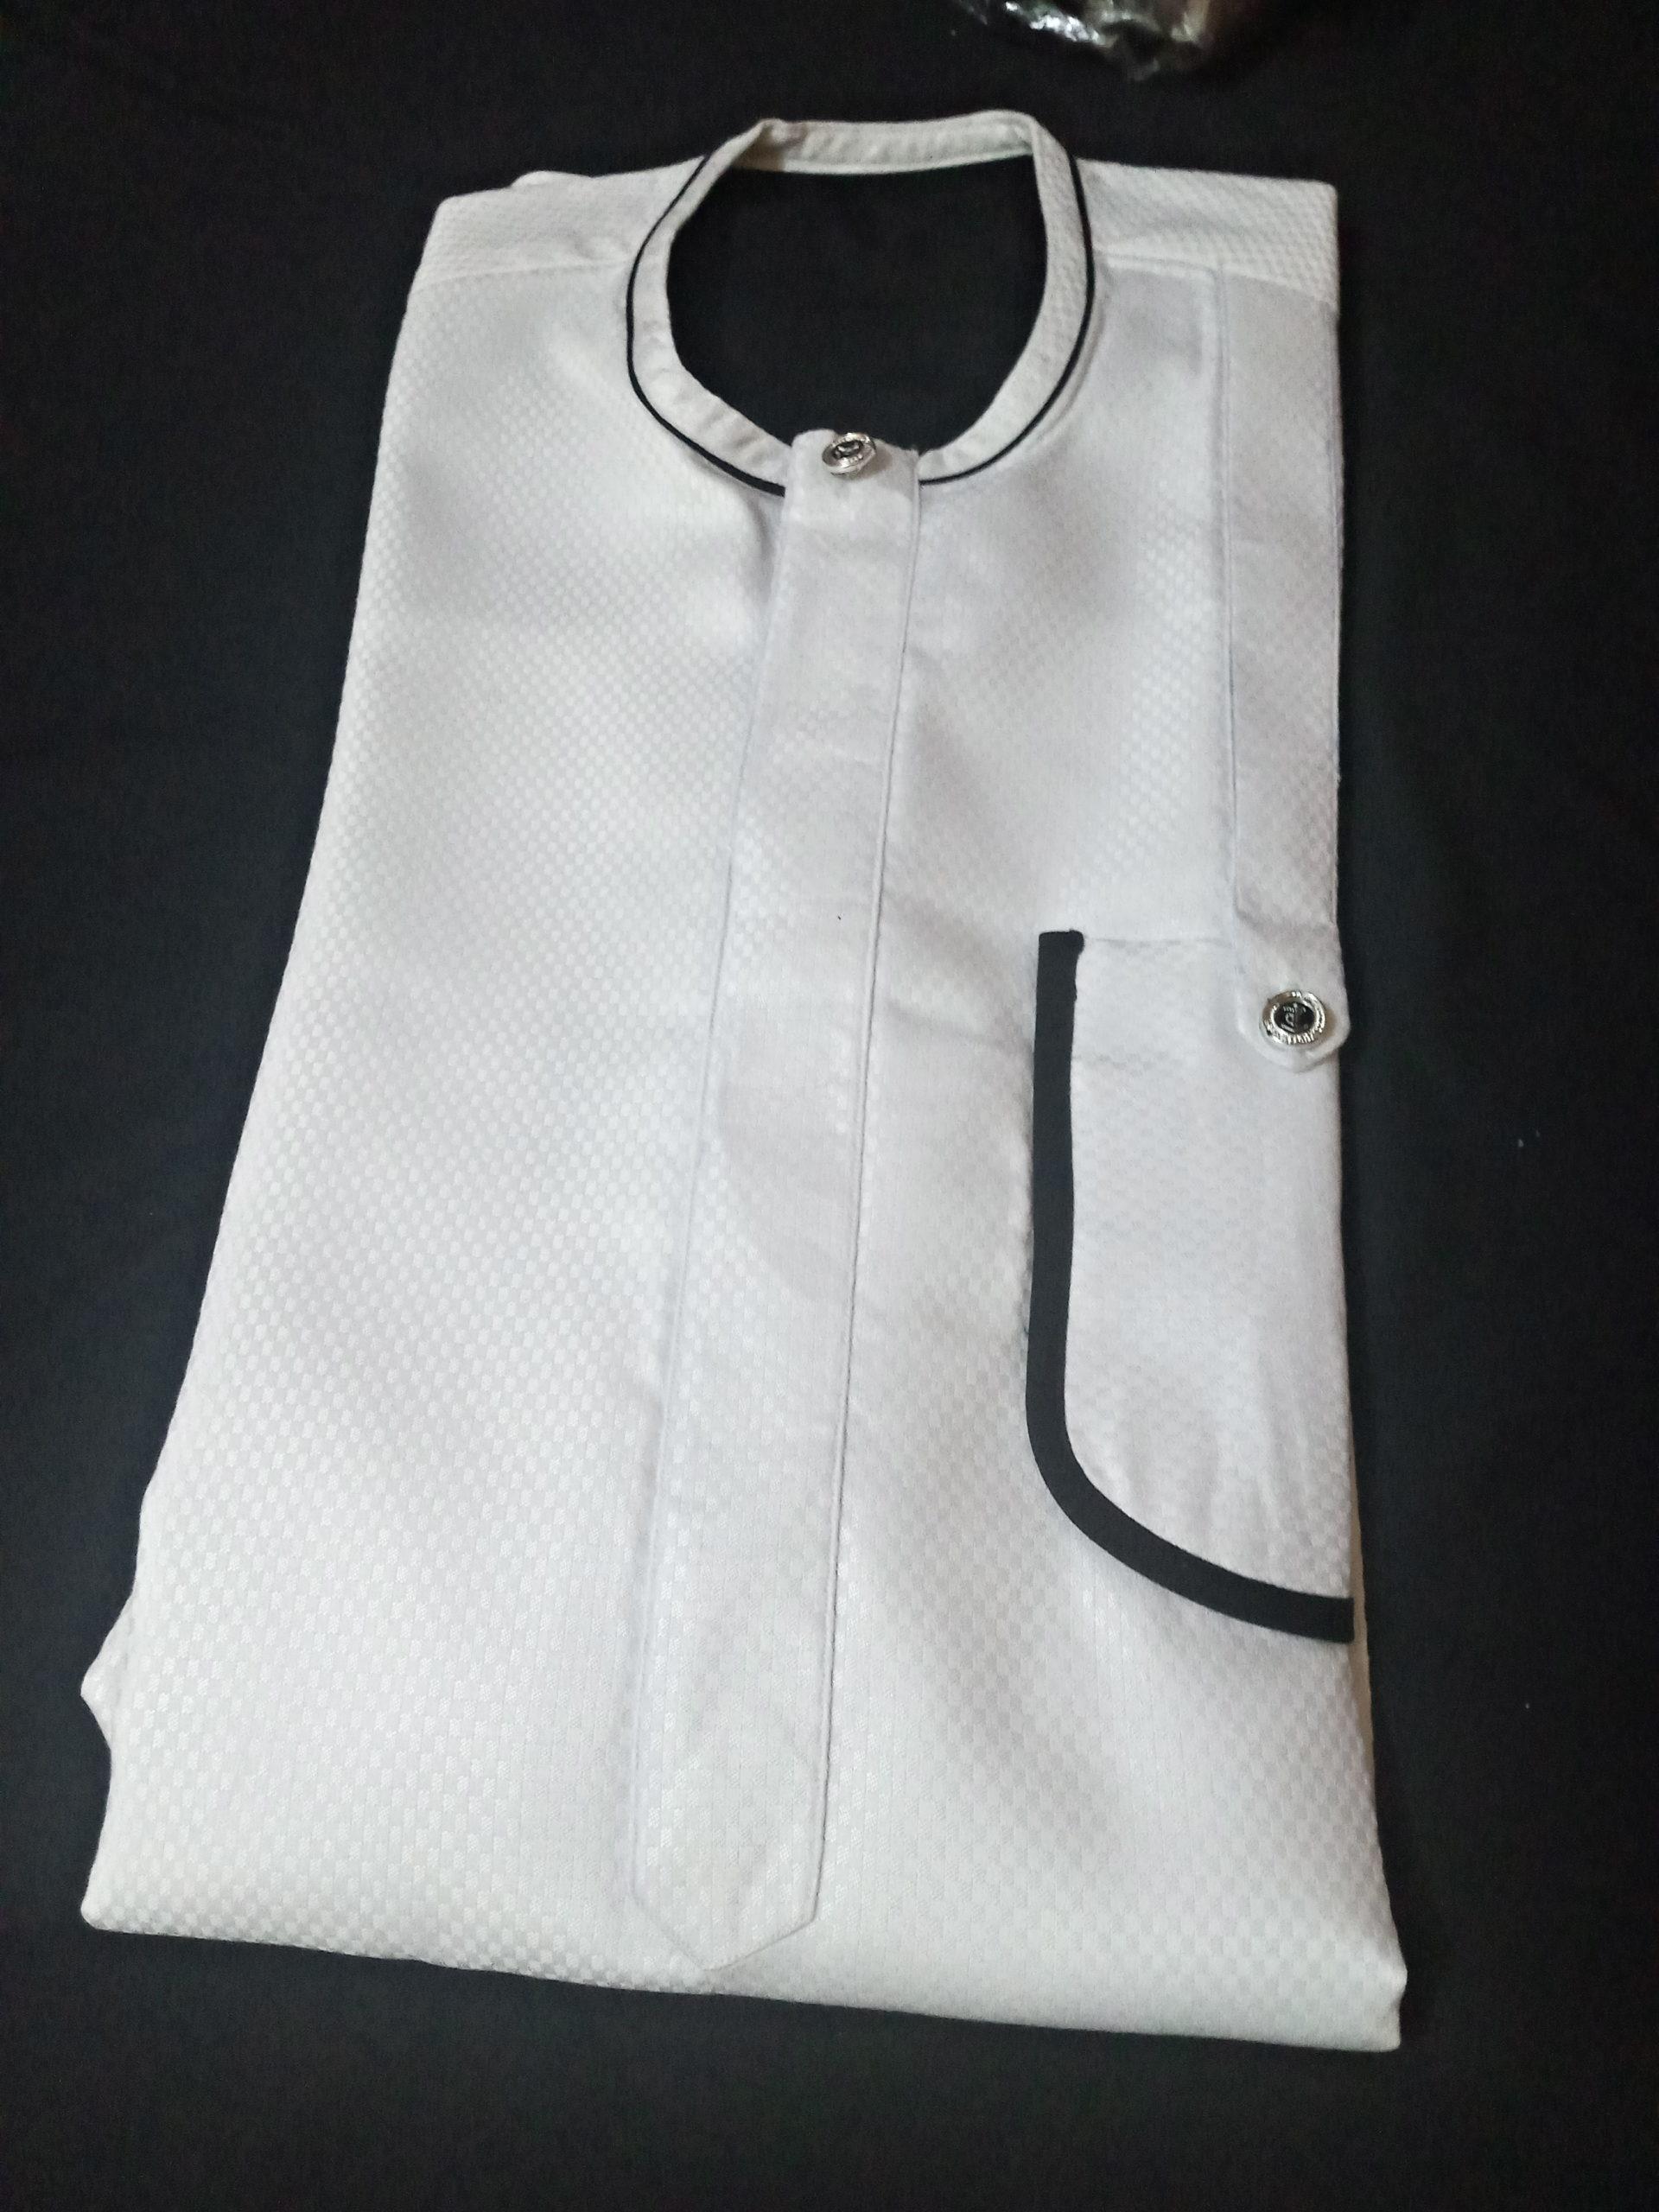 Jaypis Fashion